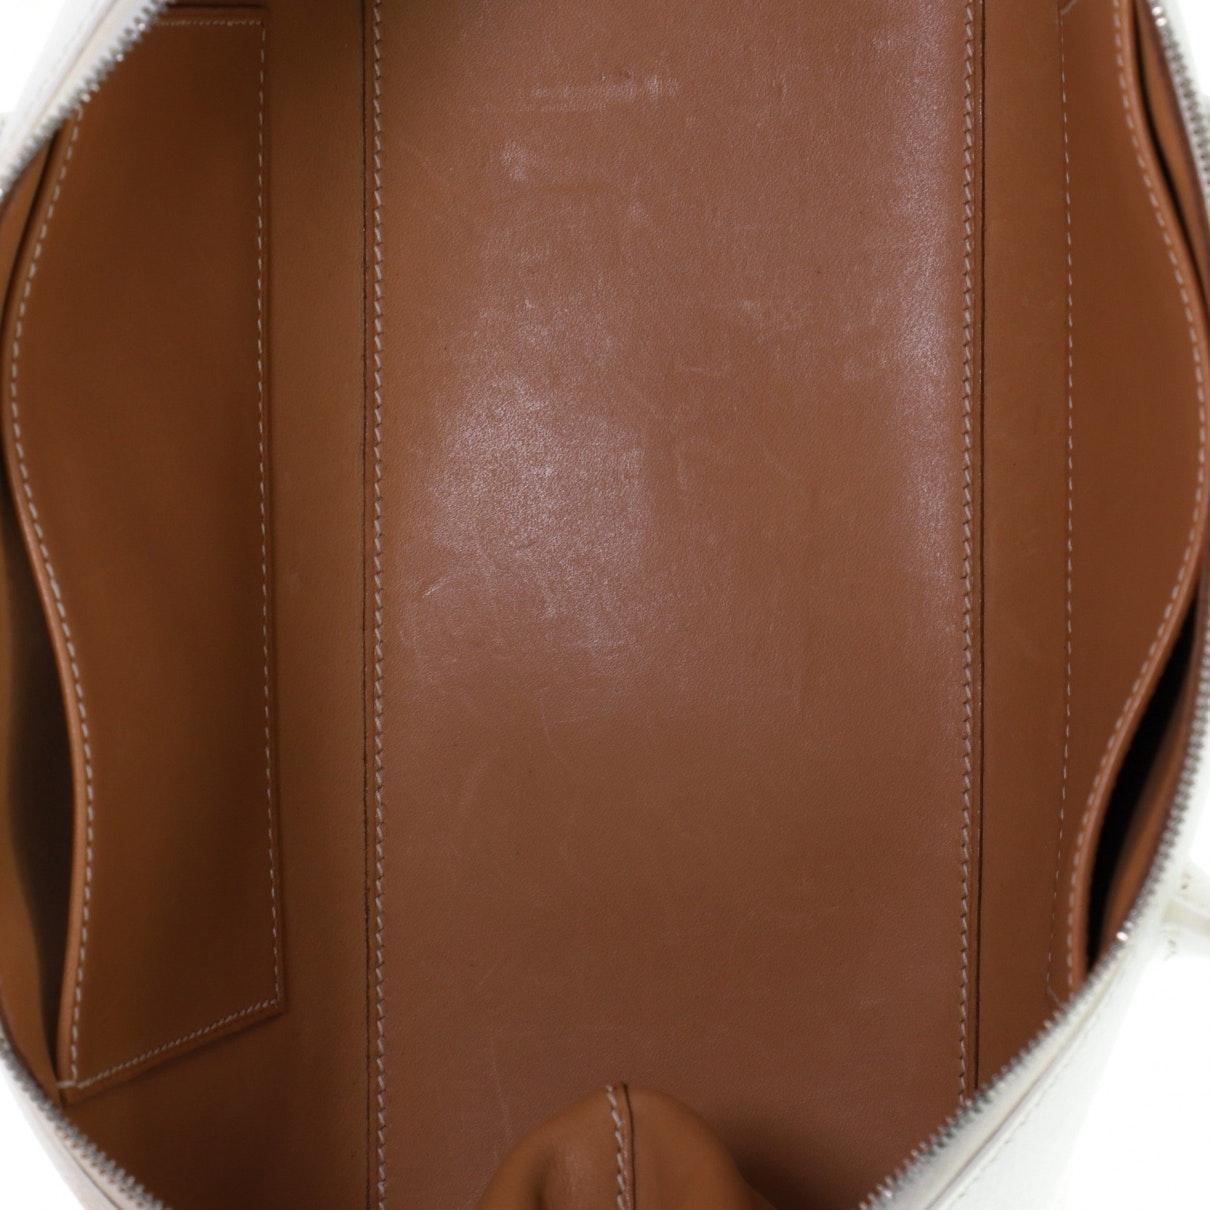 Hermès Leder Leder Handtaschen in Weiß oNGxH